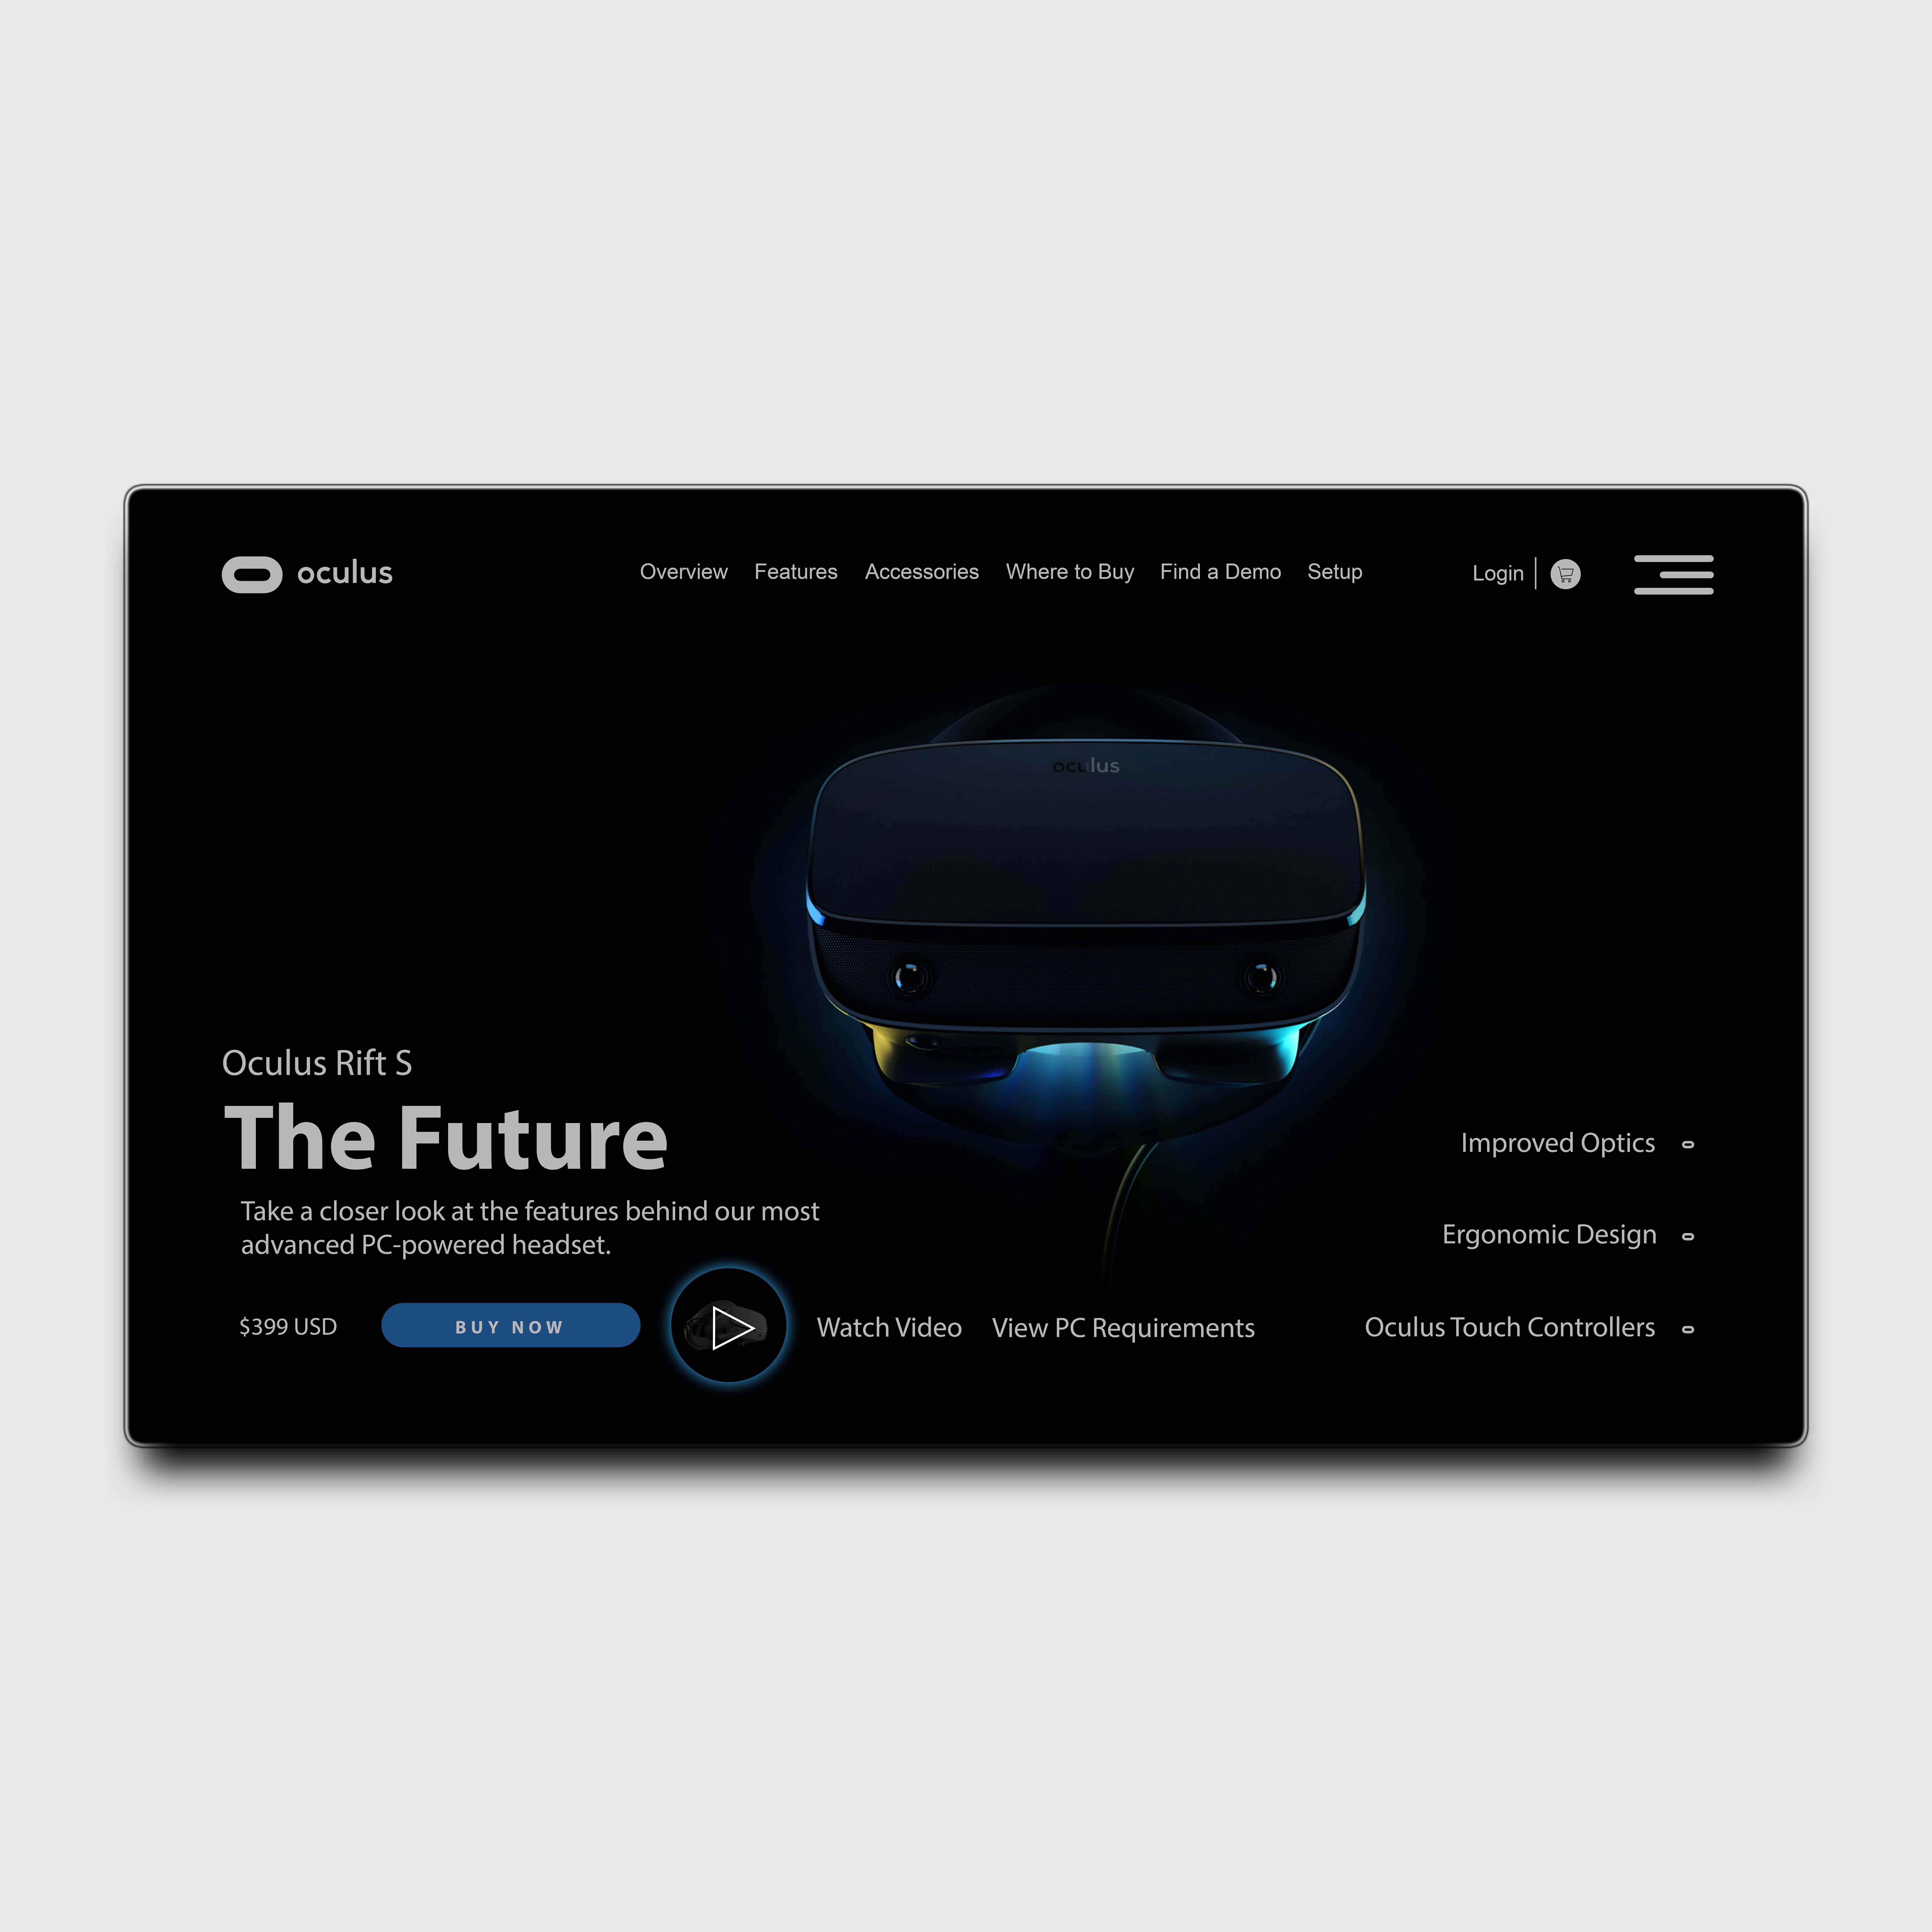 Oculus Rift Sample UI